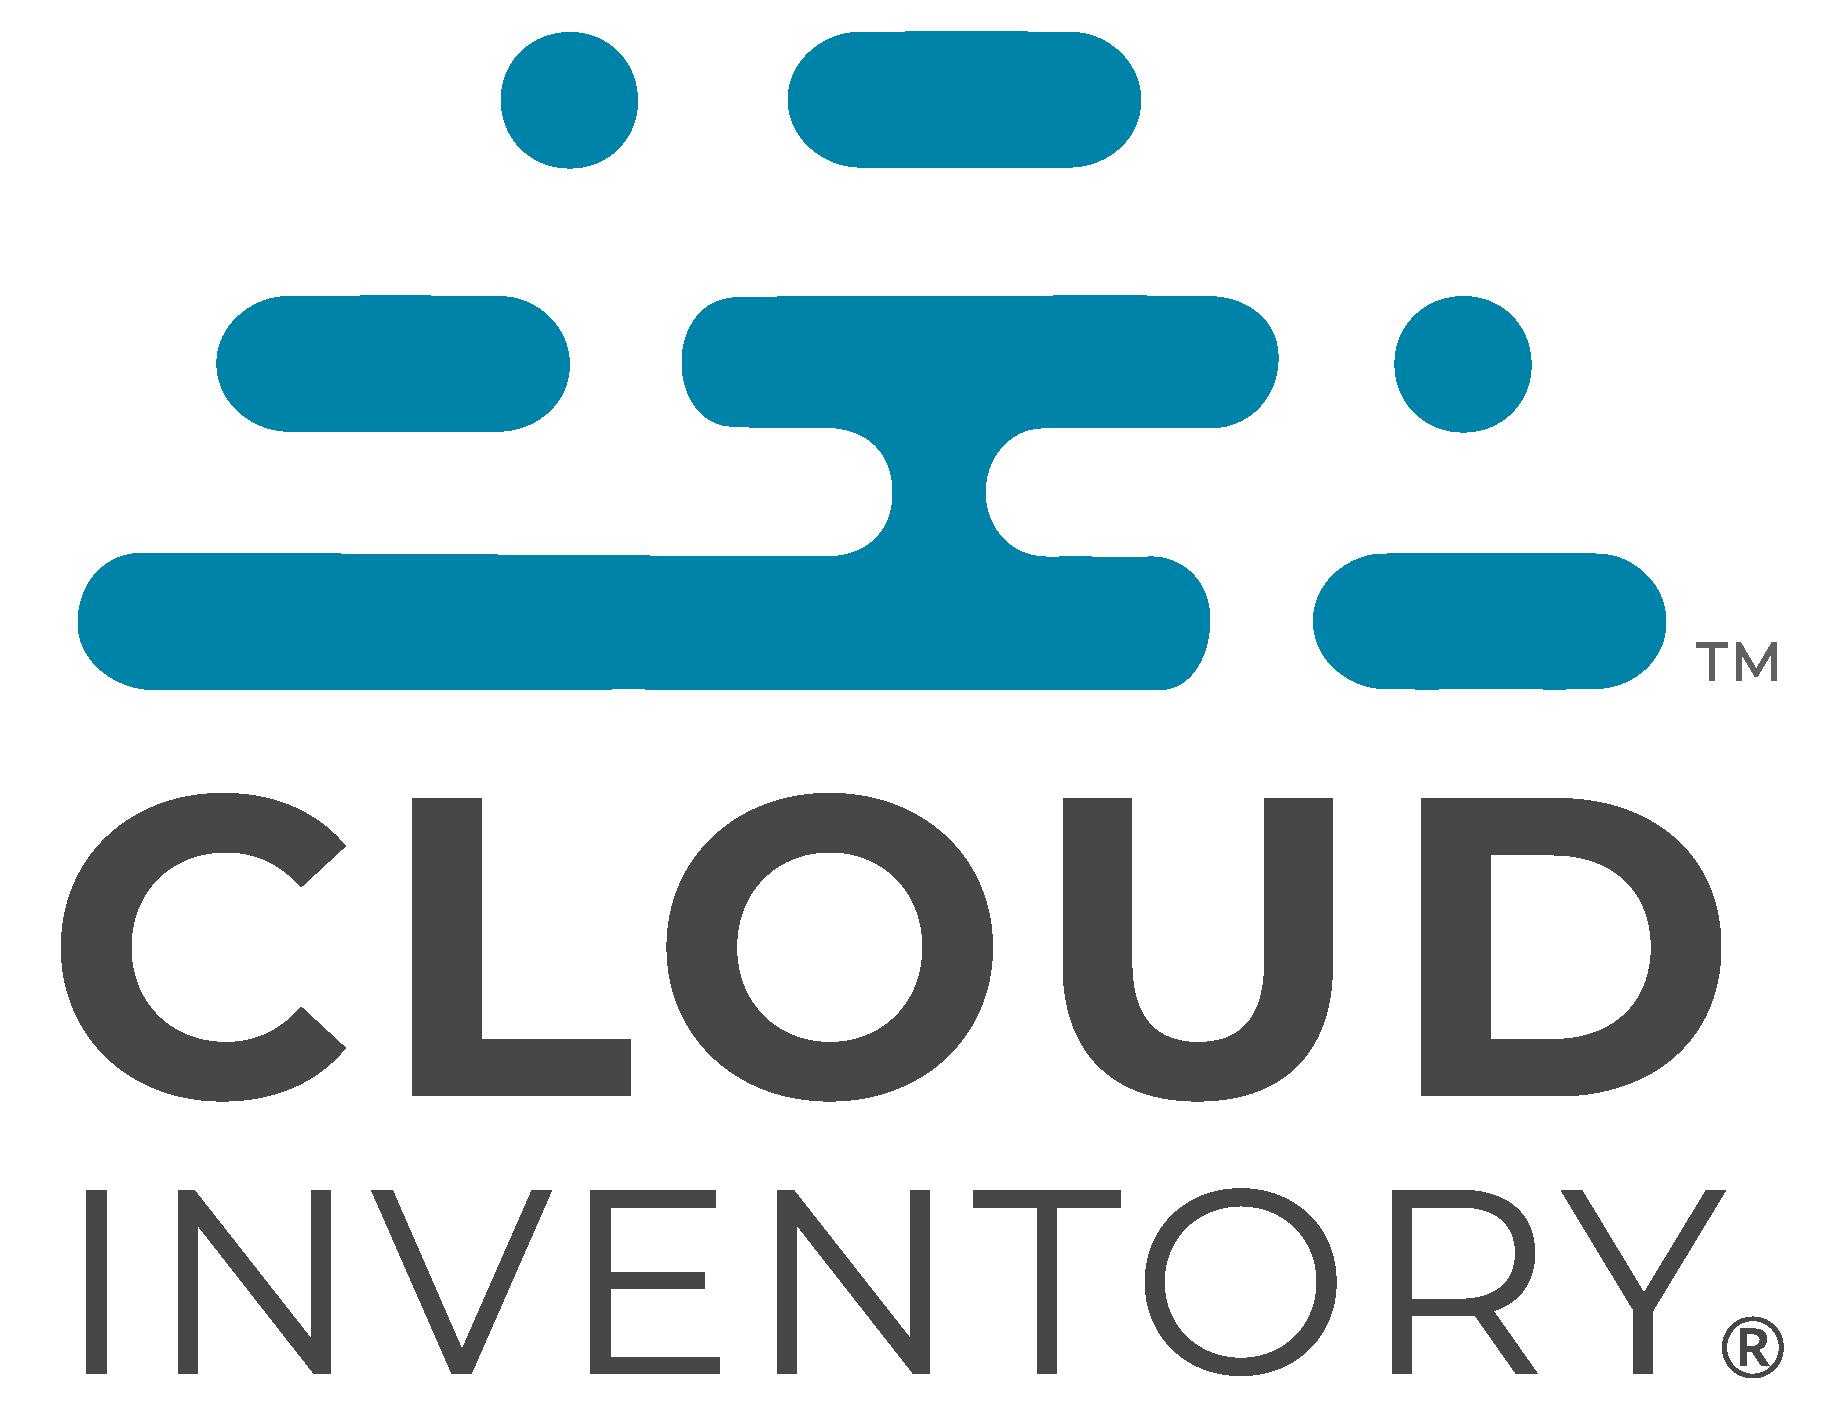 Cloud-Inventory-Logo-PRIMARY (1)-1